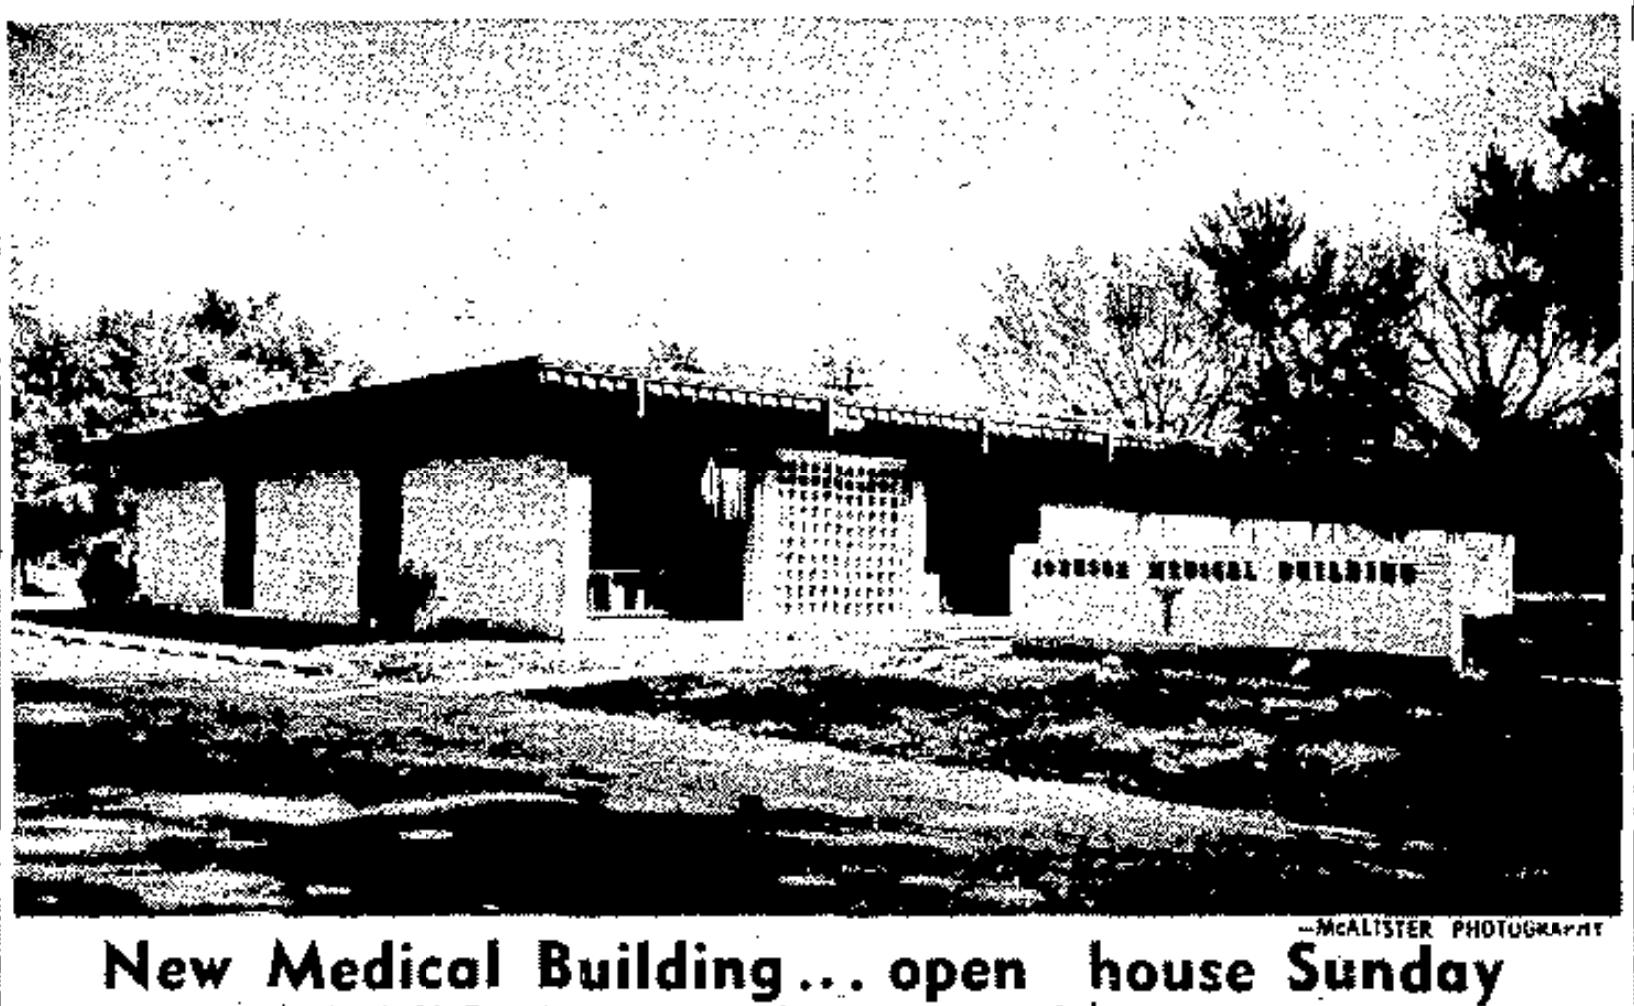 Johnson Medical Building aka Charles Drew Health Center, N. 28th and Manderson Avenue, Bedford Place neighborhood, North Omaha, Nebraska